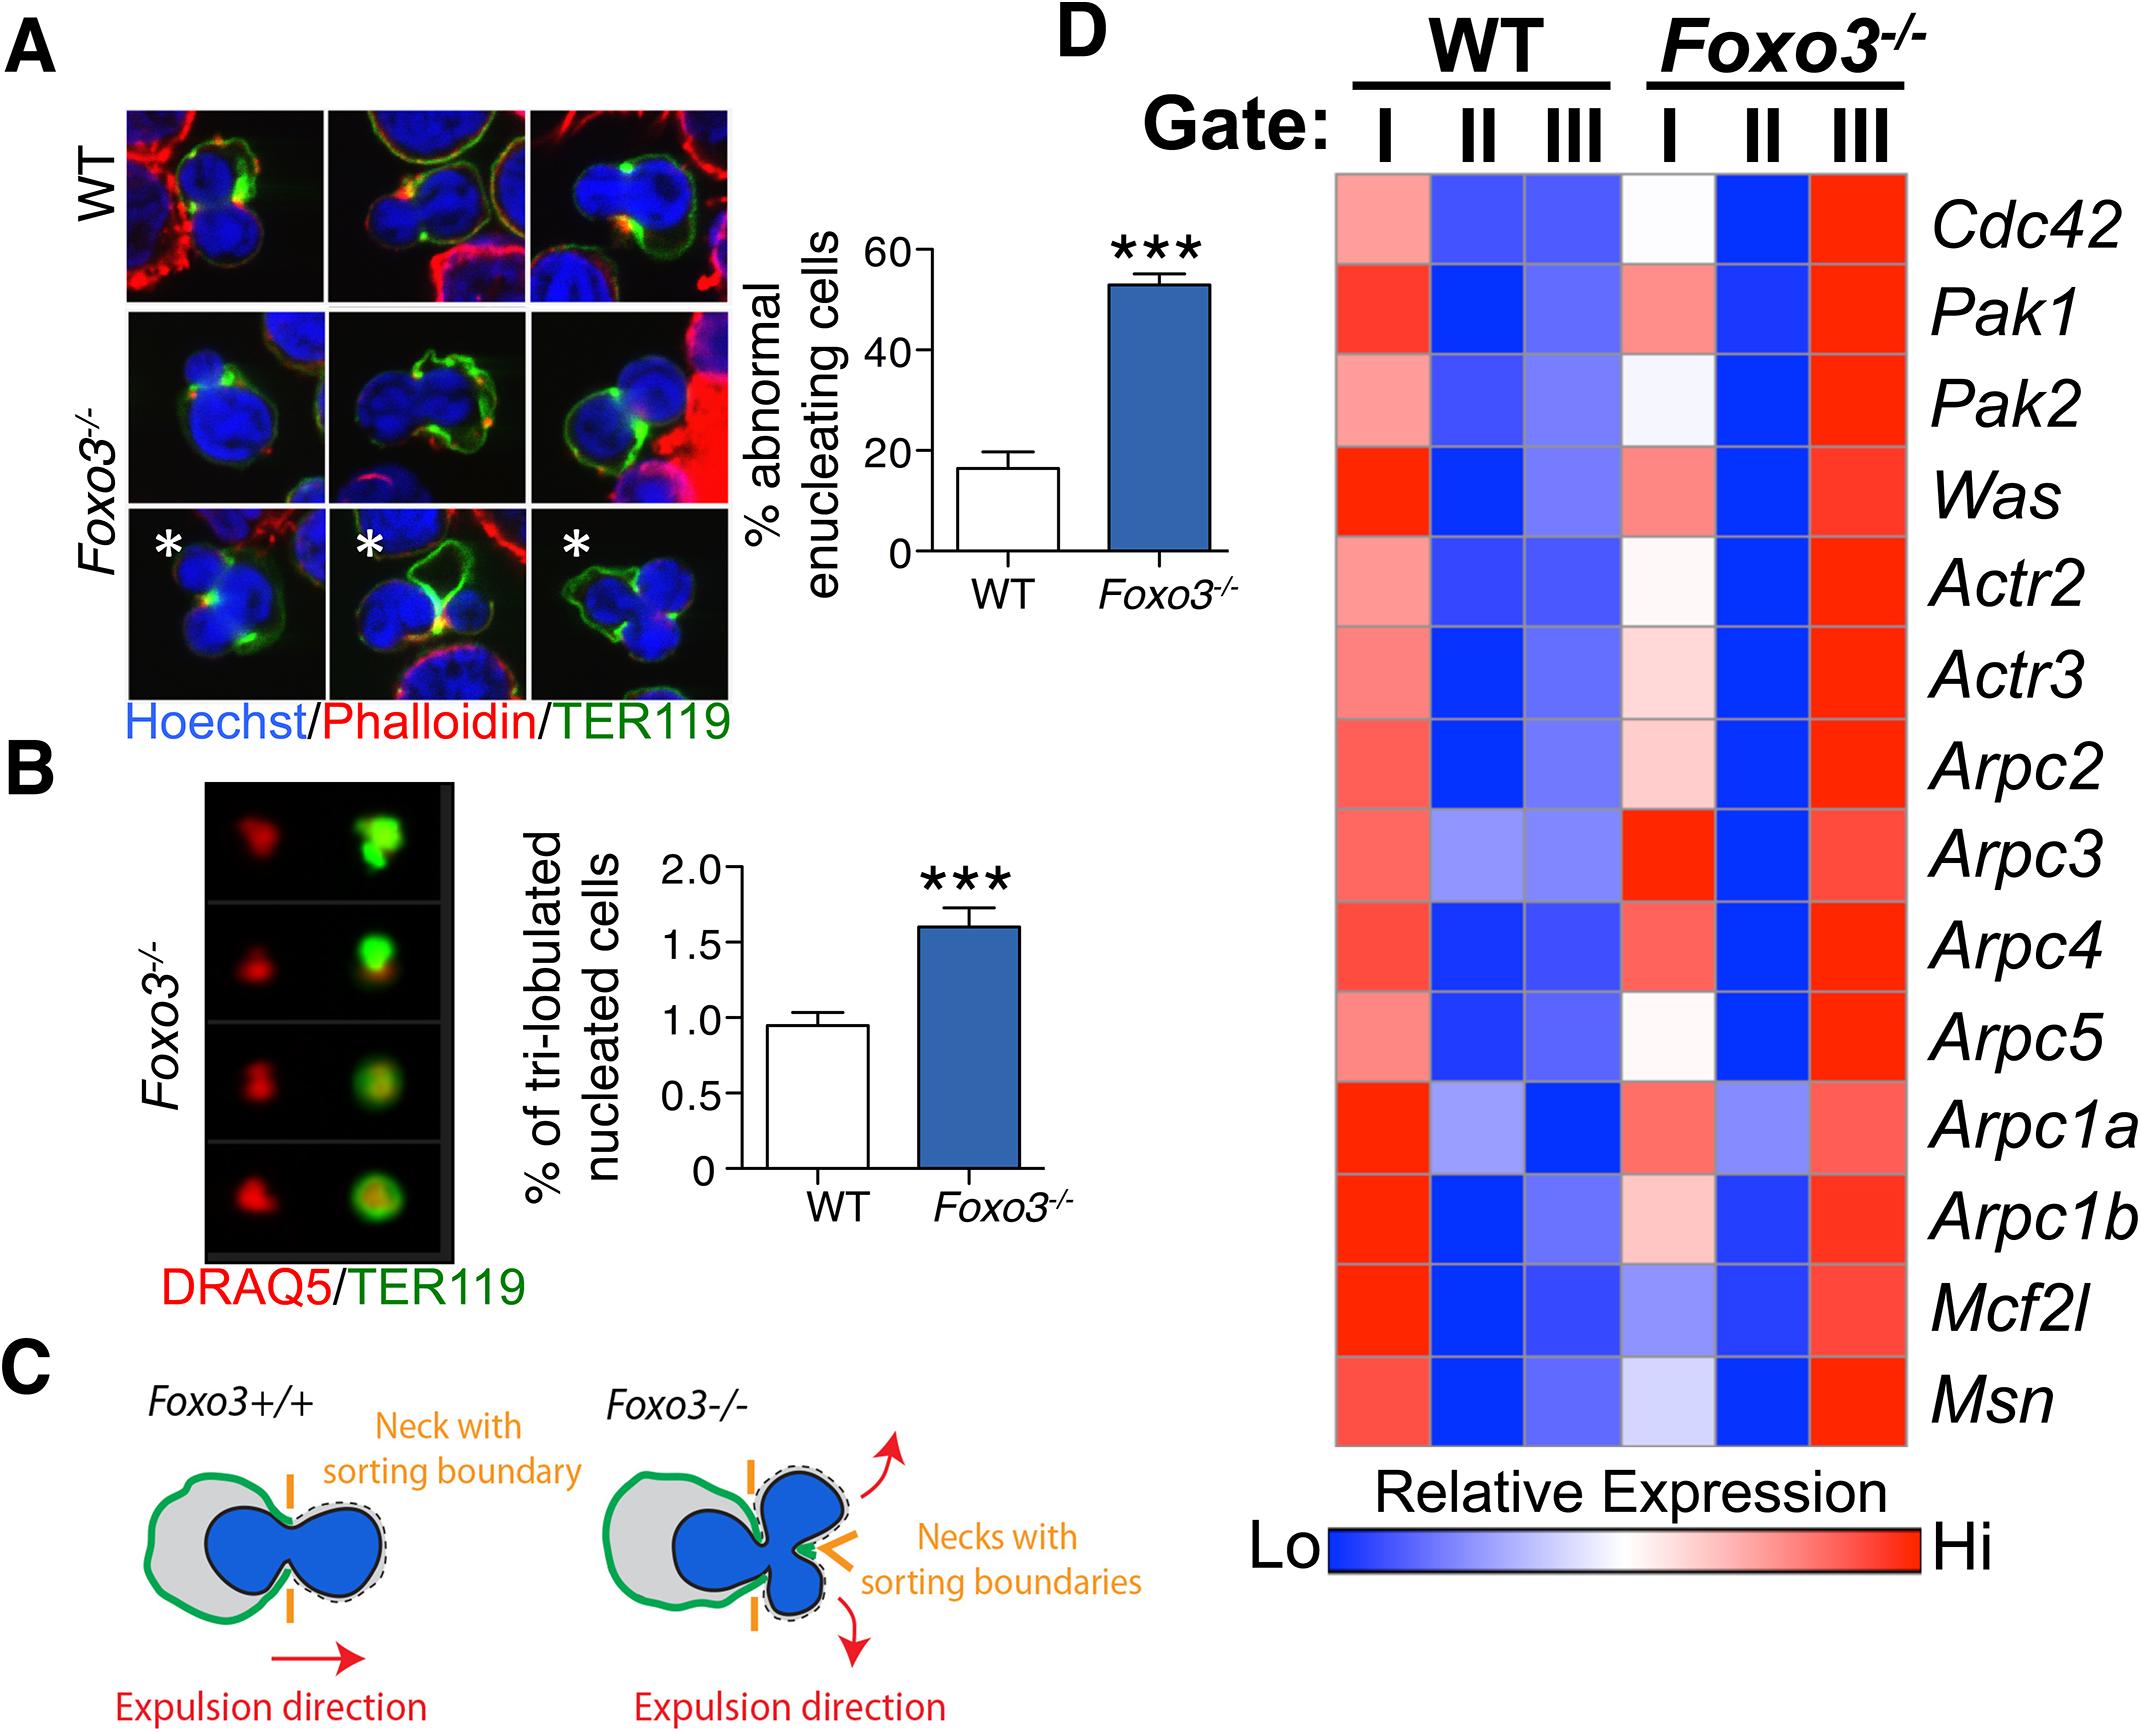 Defective enucleation in <i>Foxo3</i><sup><i>-/-</i></sup> bone marrow erythroblasts.